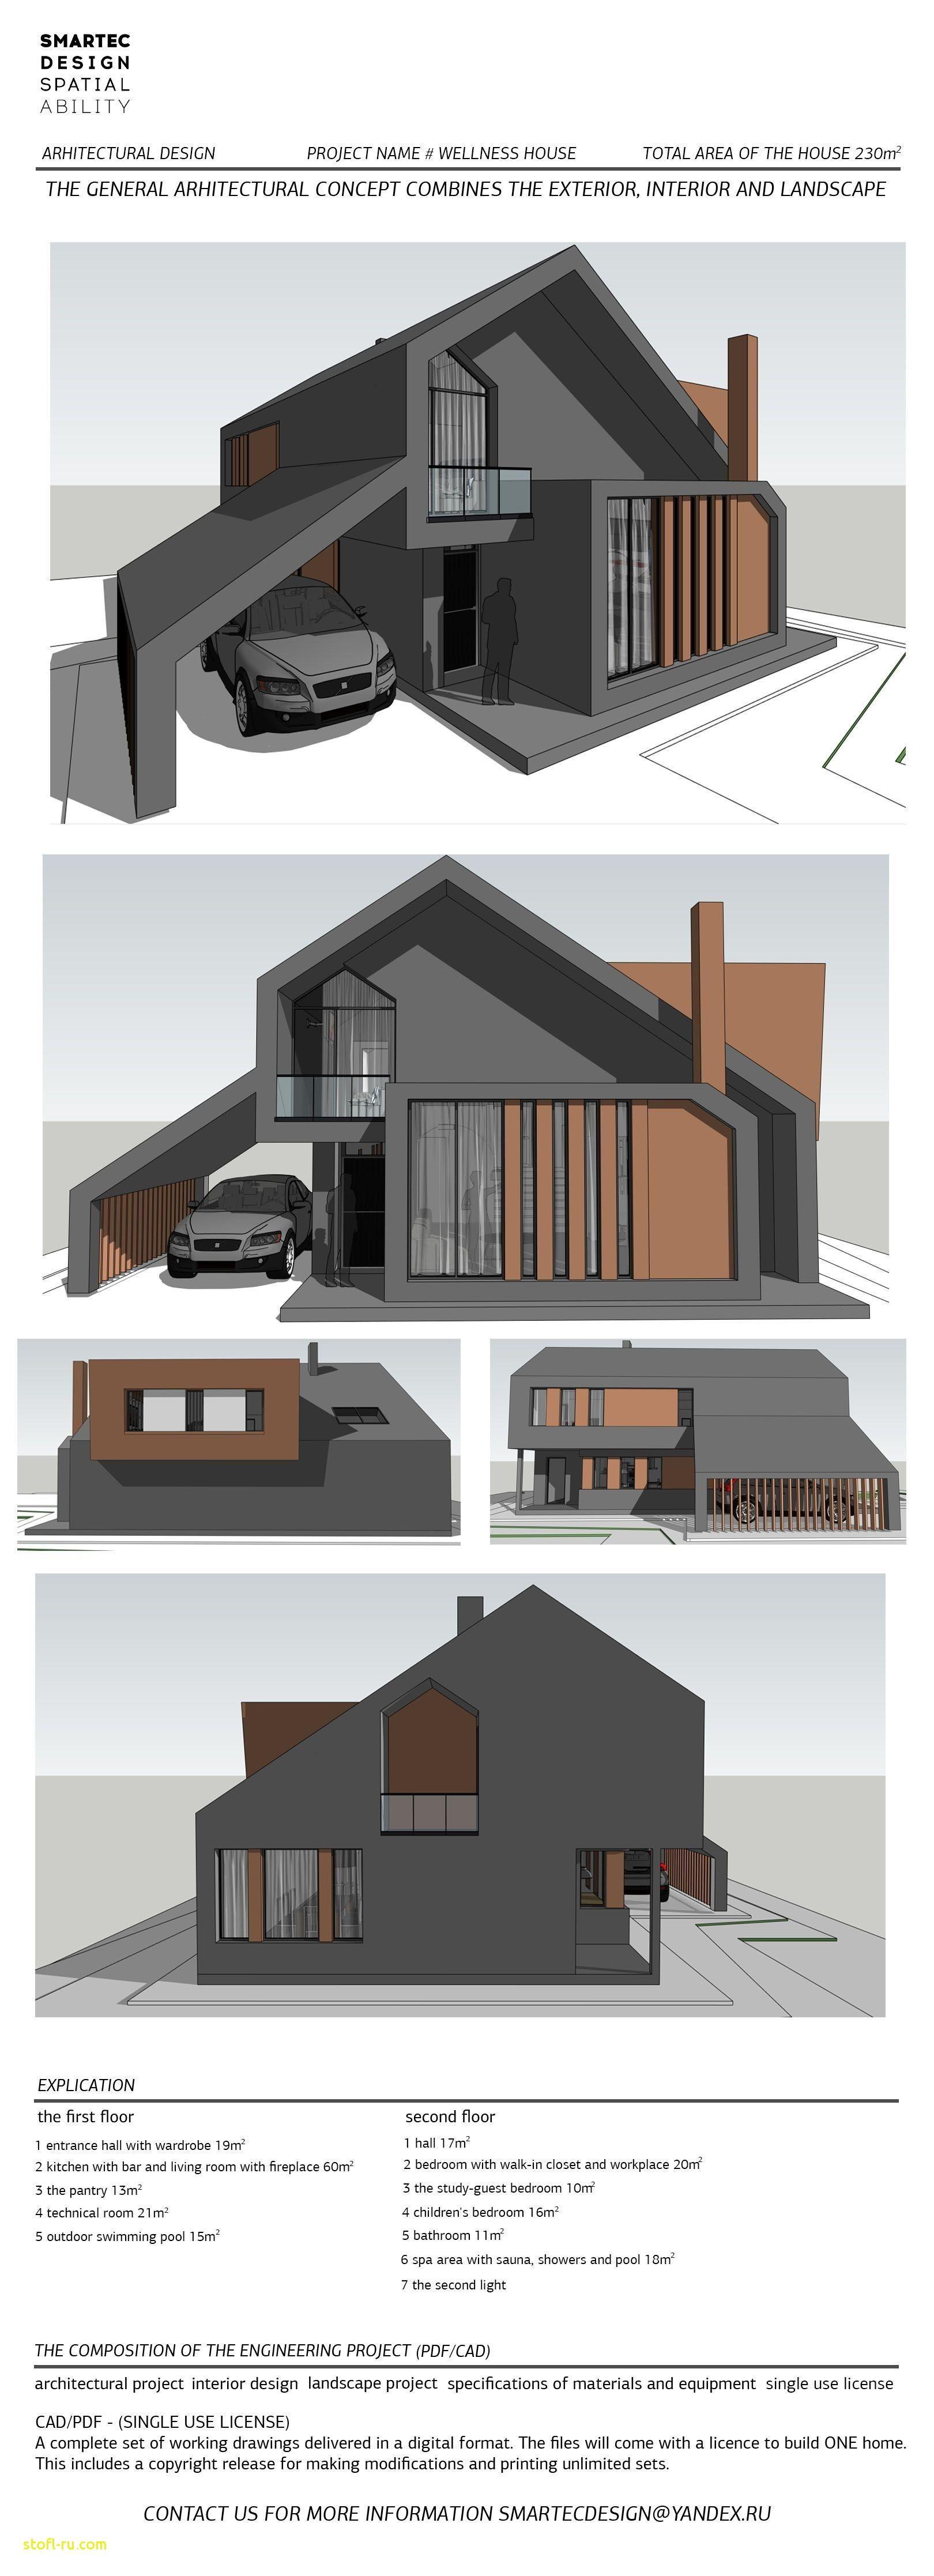 3d Home Architect Home Design Deluxe 6 3dhomearchitectdesignsuitedeluxe 3dhomearchitectdesignsuitedeluxe8 Home Mimari Tasarim Ev Tasarim Planlari Ev Plani